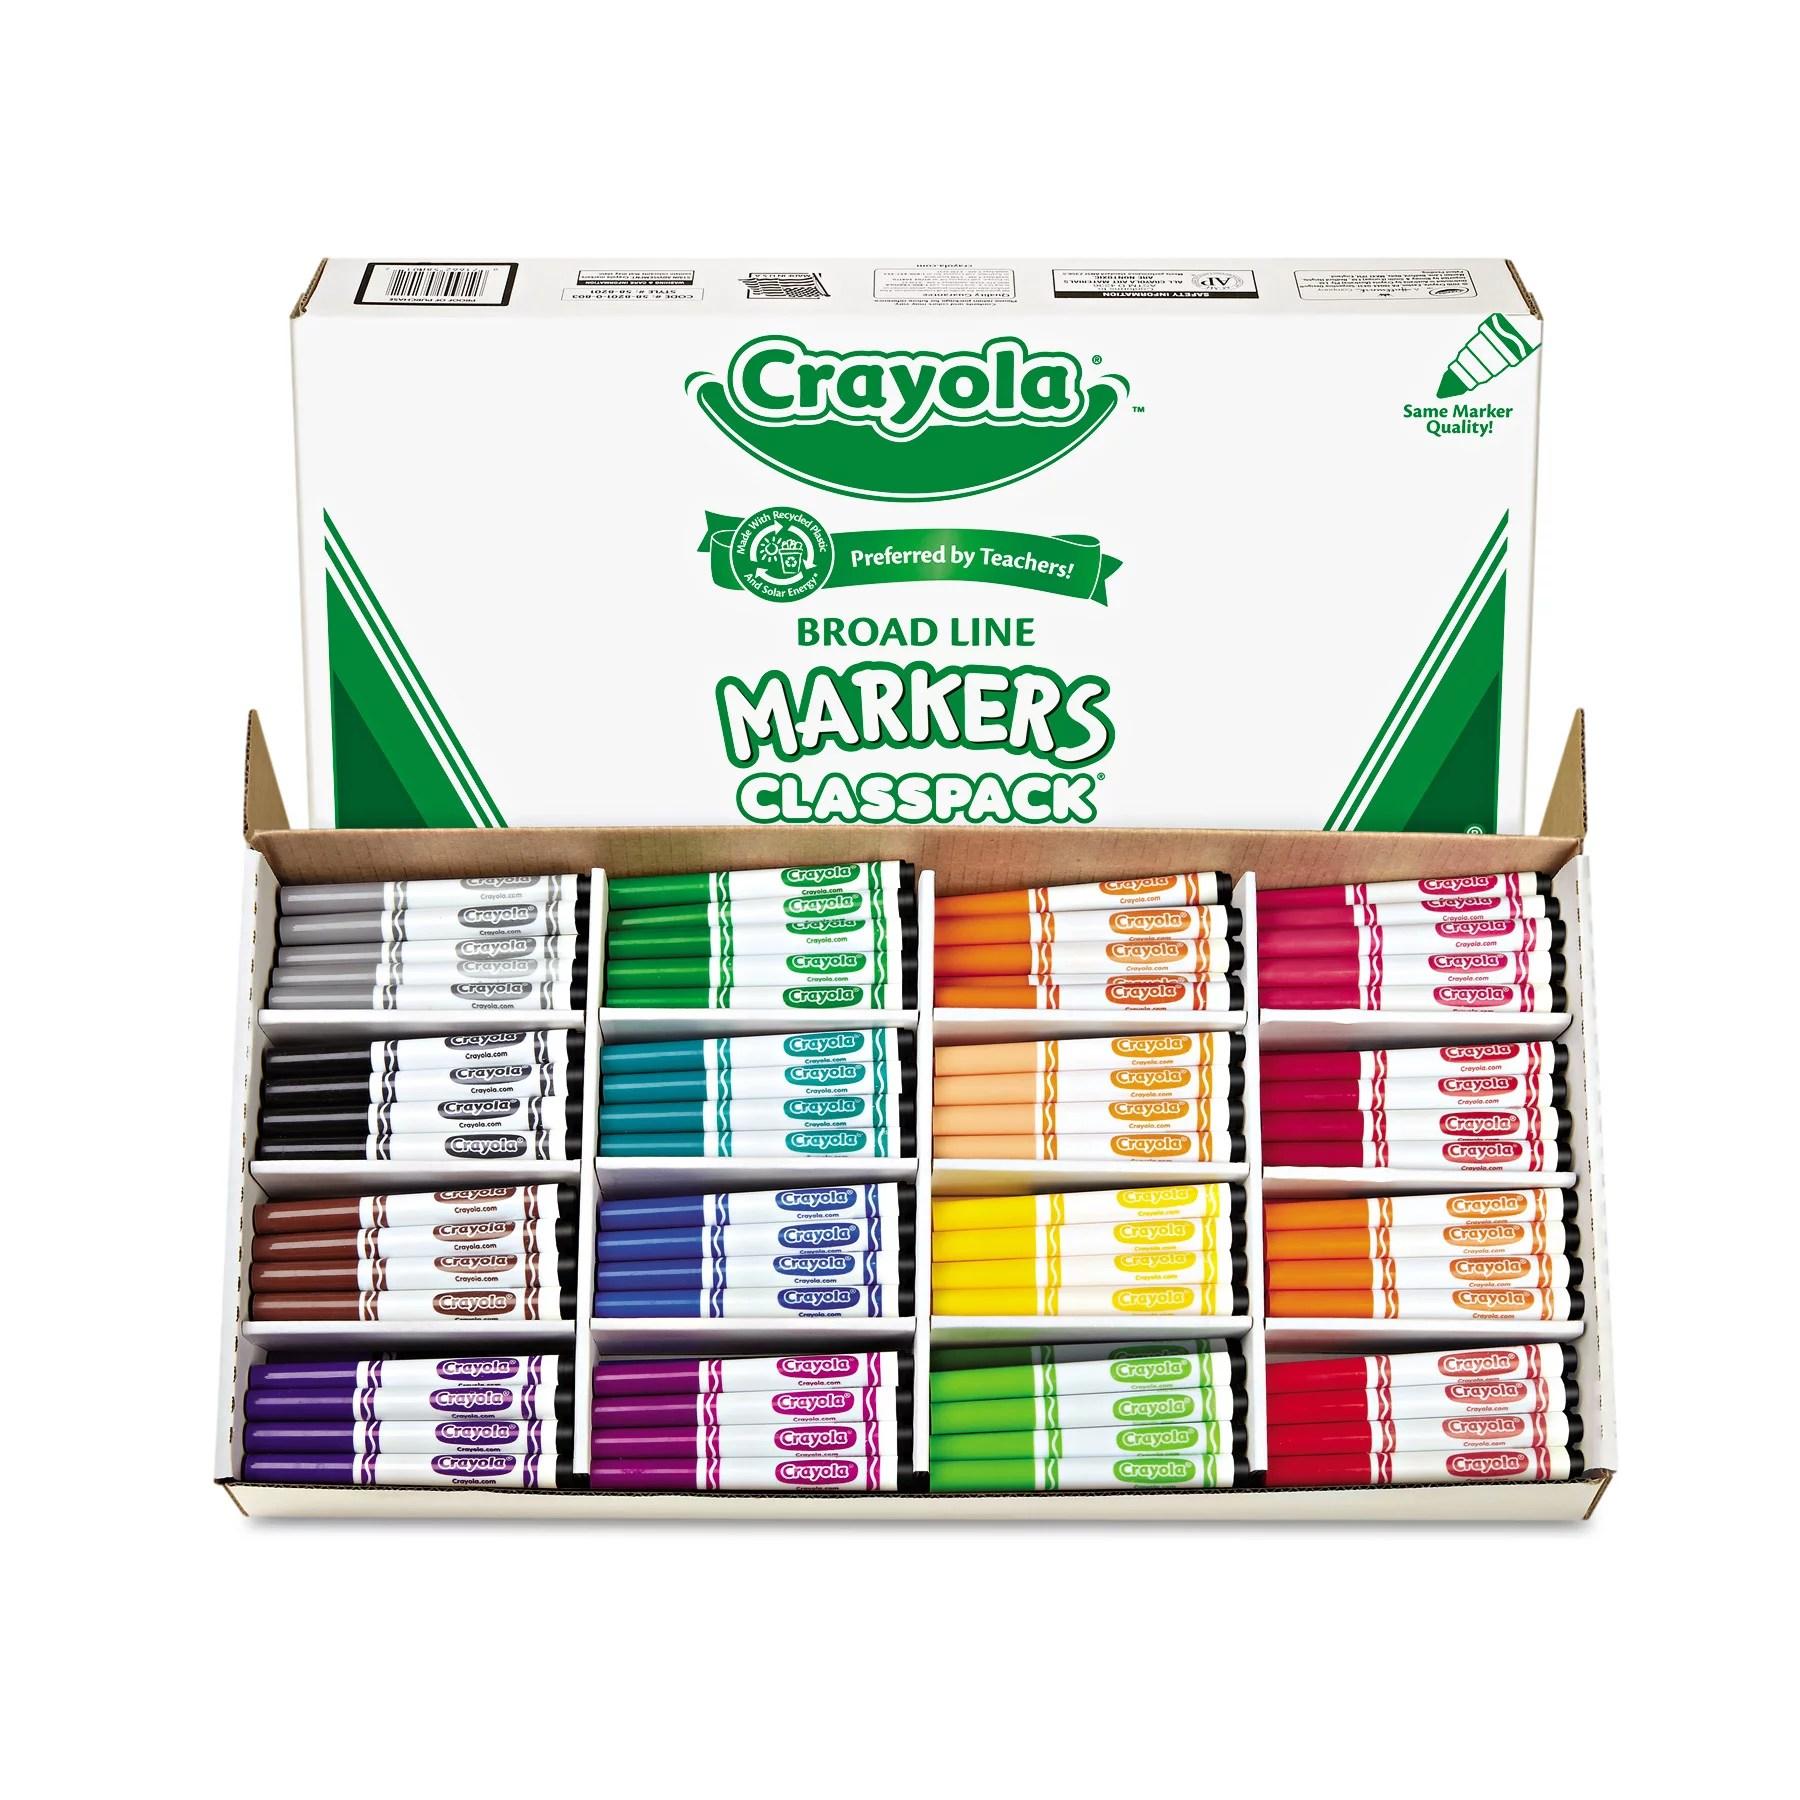 Crayola Broad Line Markers Bulk 256 Count Classpack Non